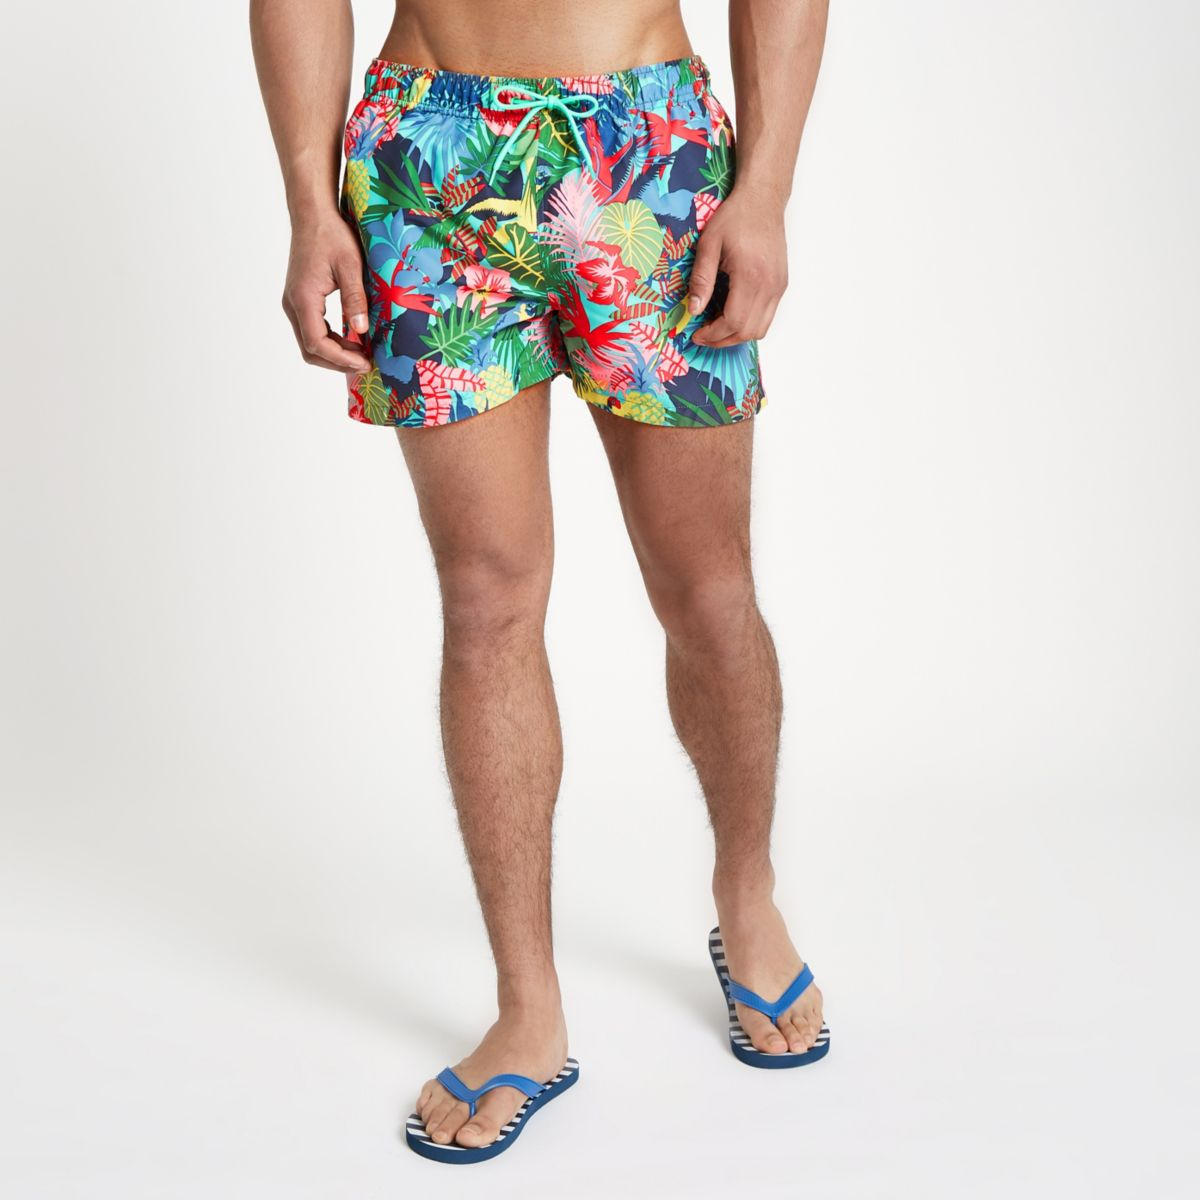 Green jungle print short swim trunks